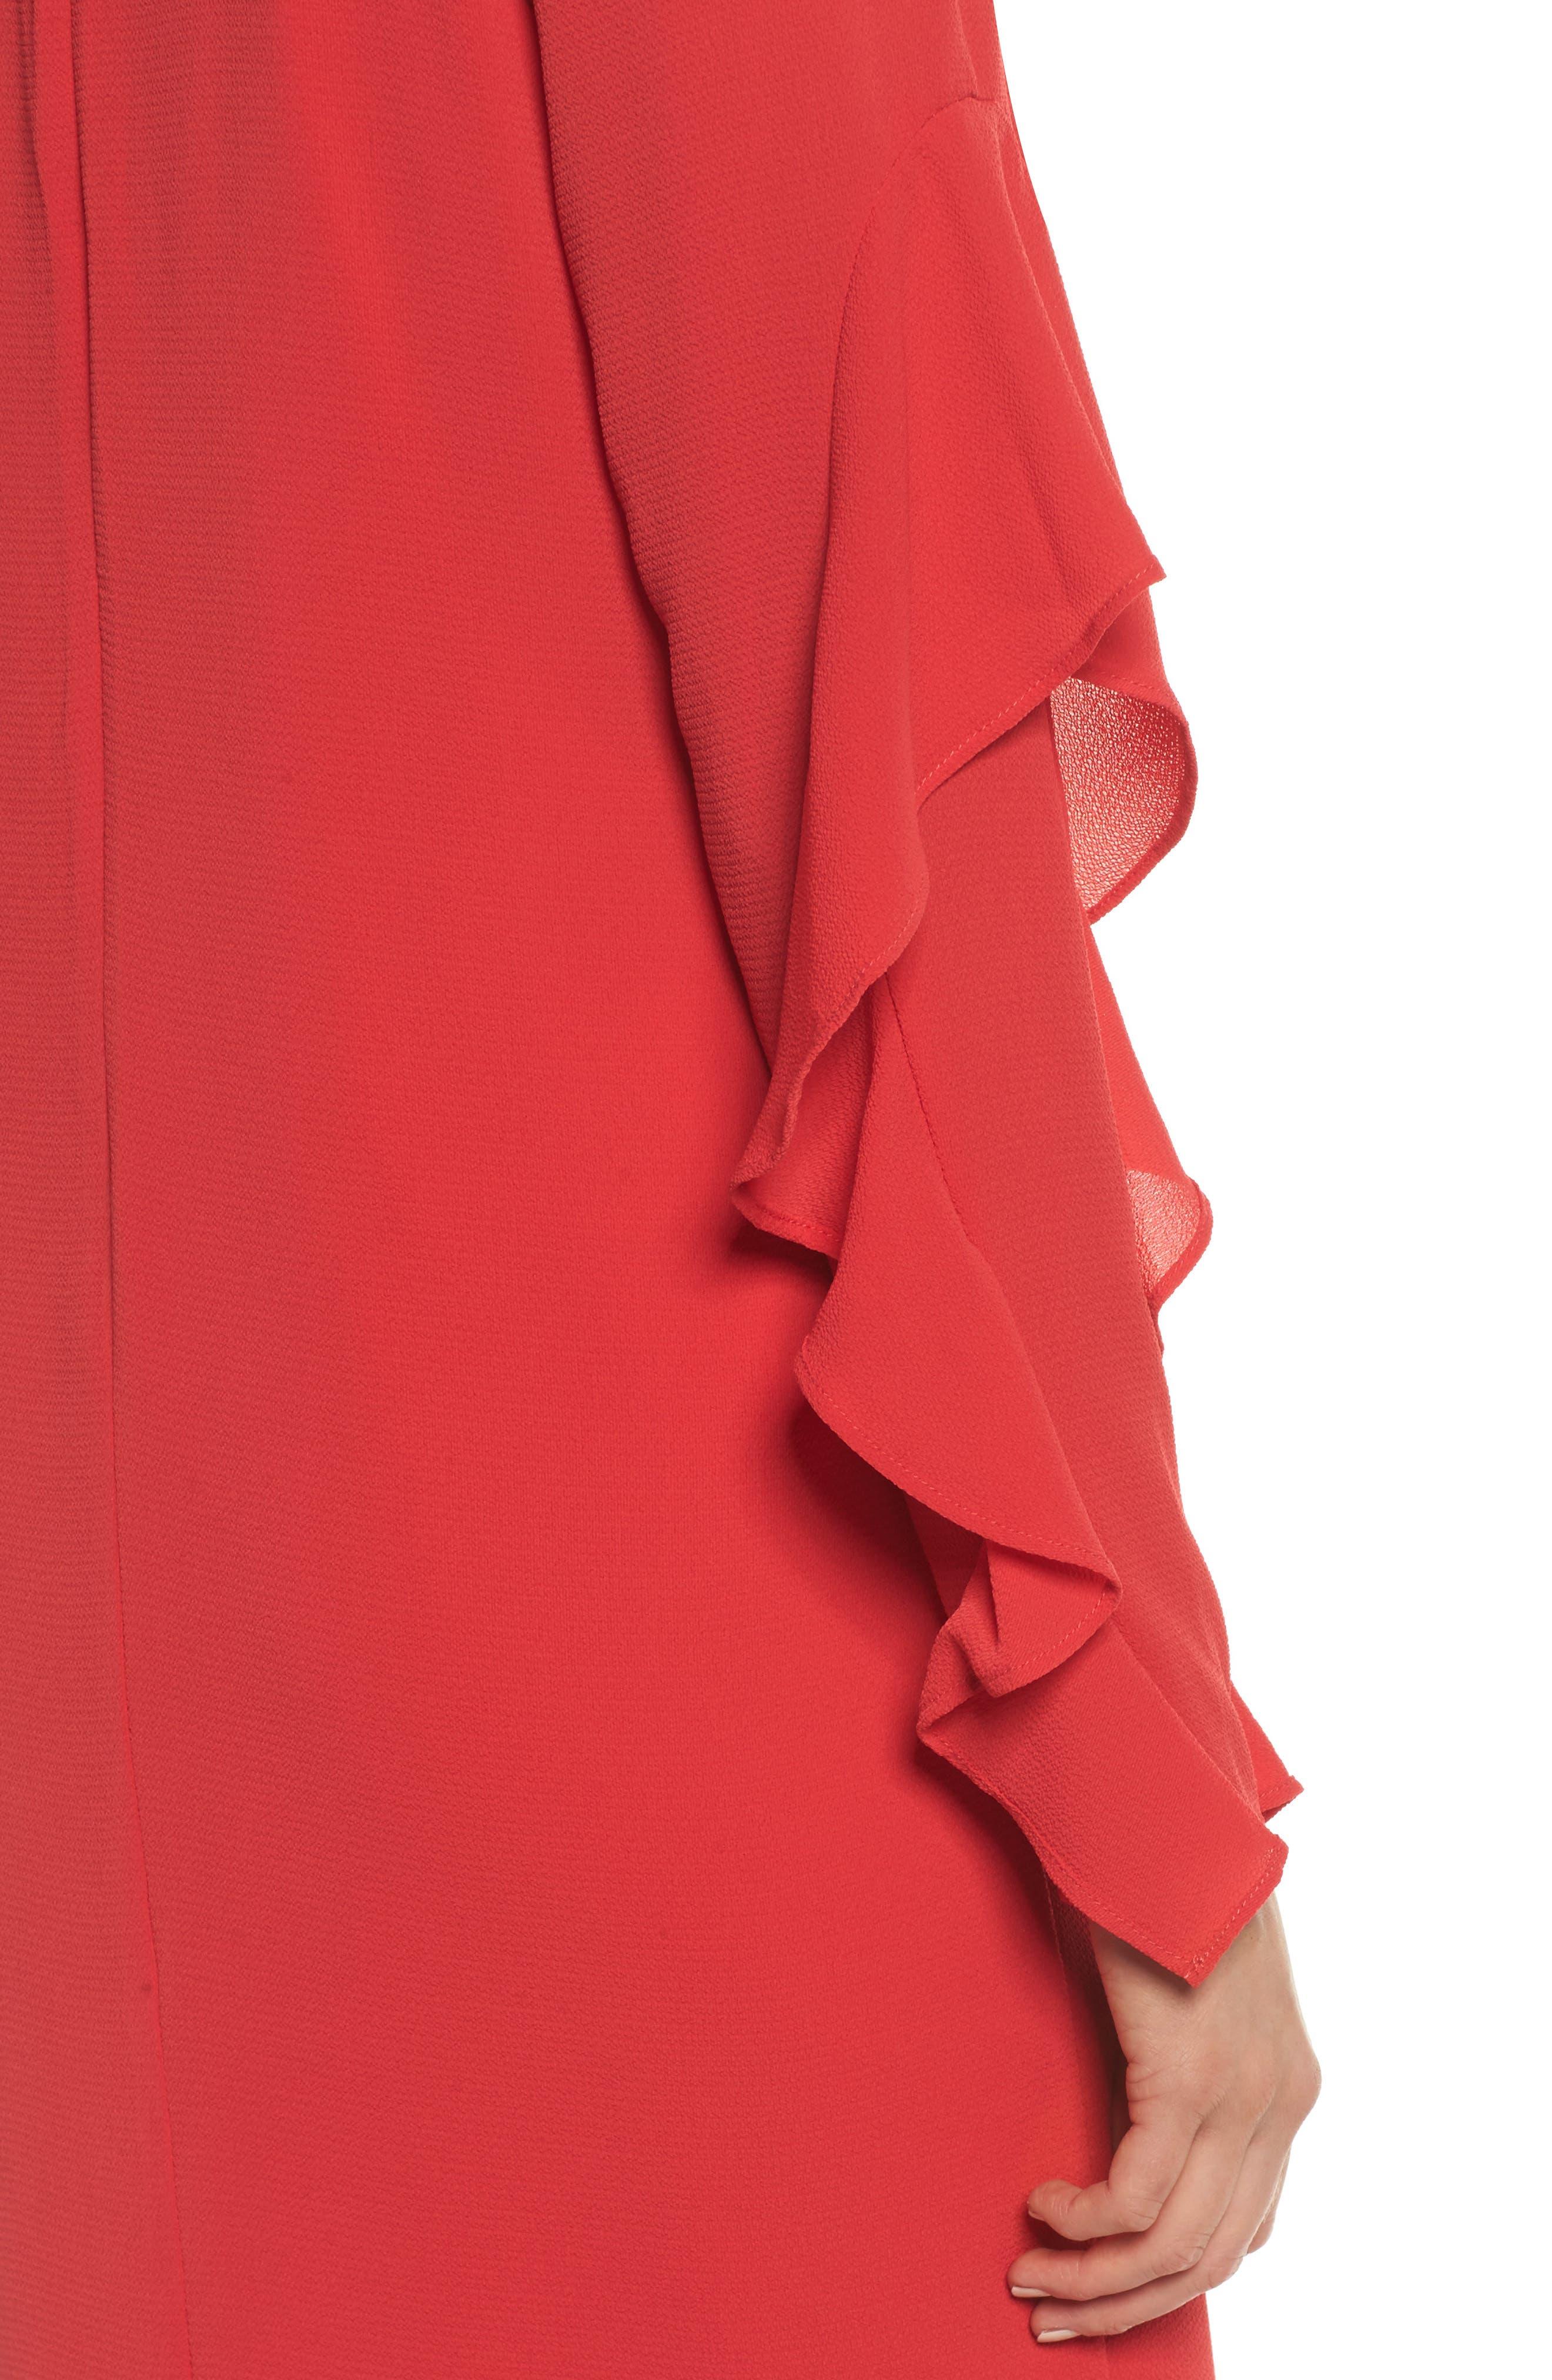 Catalina Ruffle Sleeve Dress,                             Alternate thumbnail 4, color,                             648